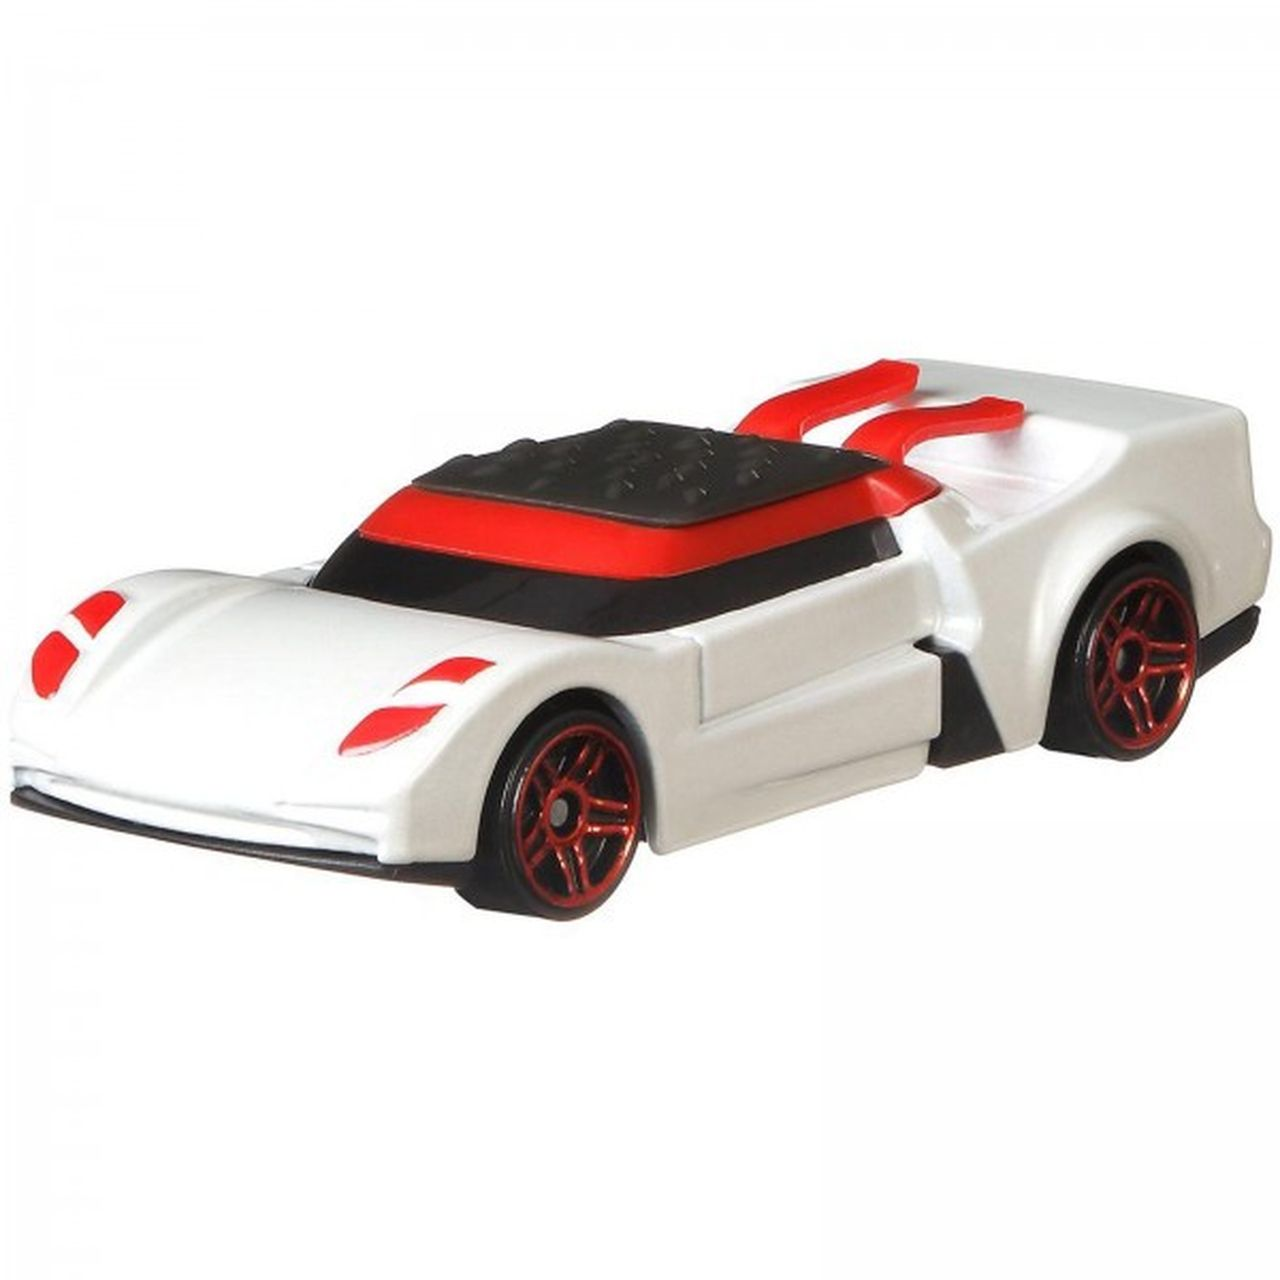 Carrinho Ryu: Street Fighter V - Hot Wheels